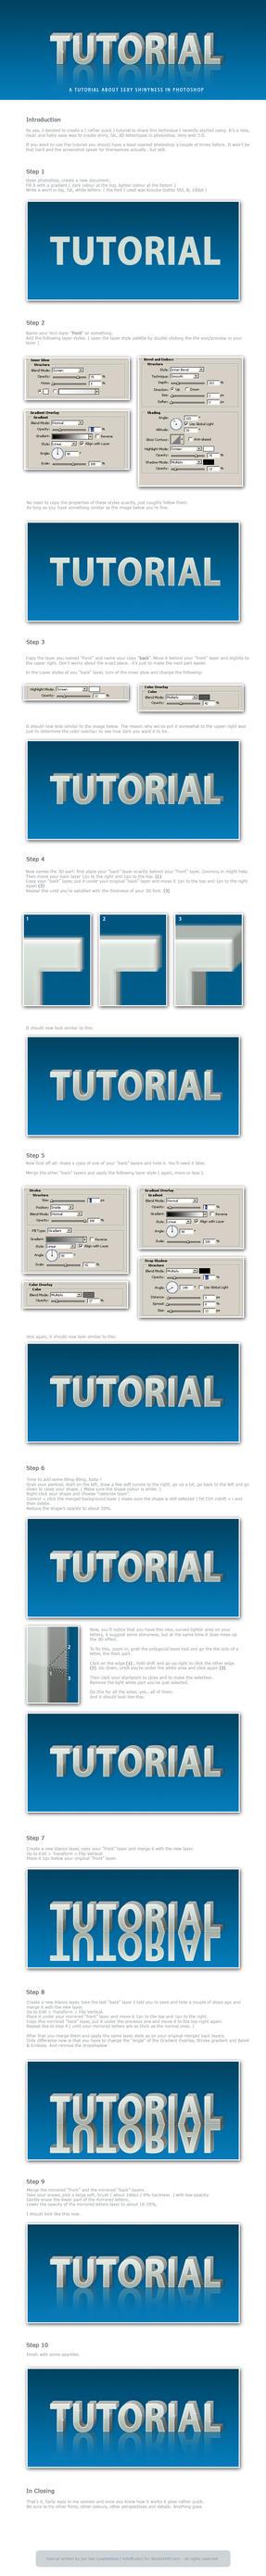 FV: Shiny 3D Fonts Tutorial by janvanlysebettens